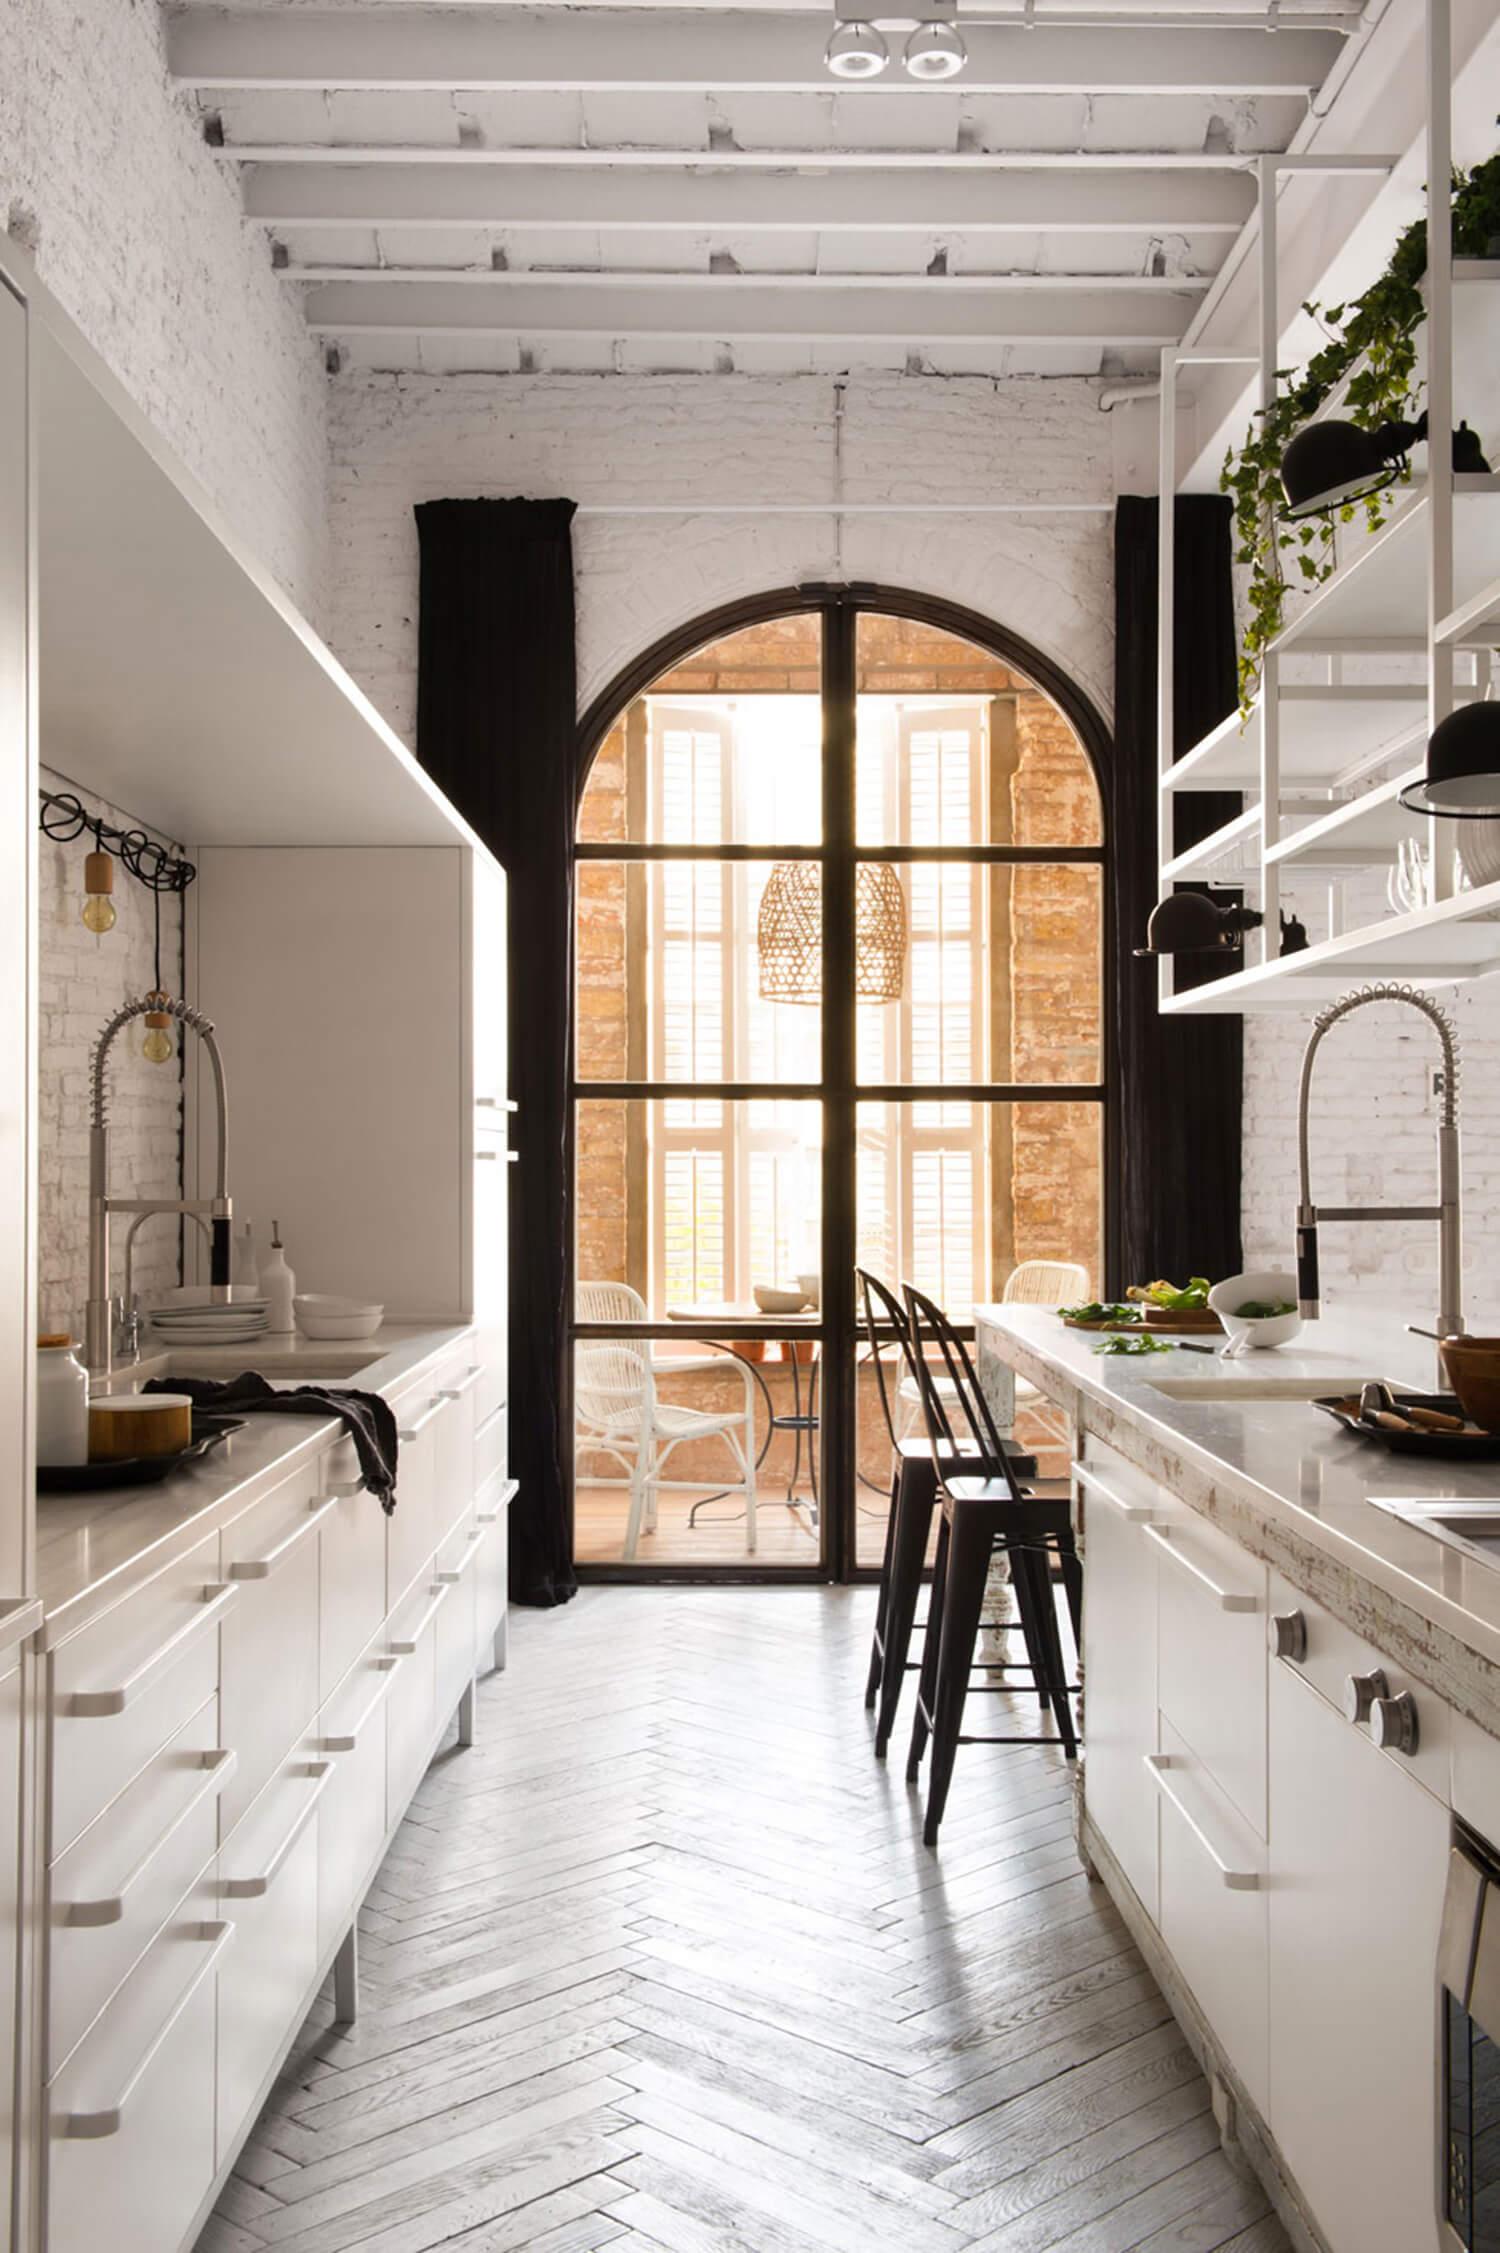 est living barcelona loft serrat tort architects kitchen